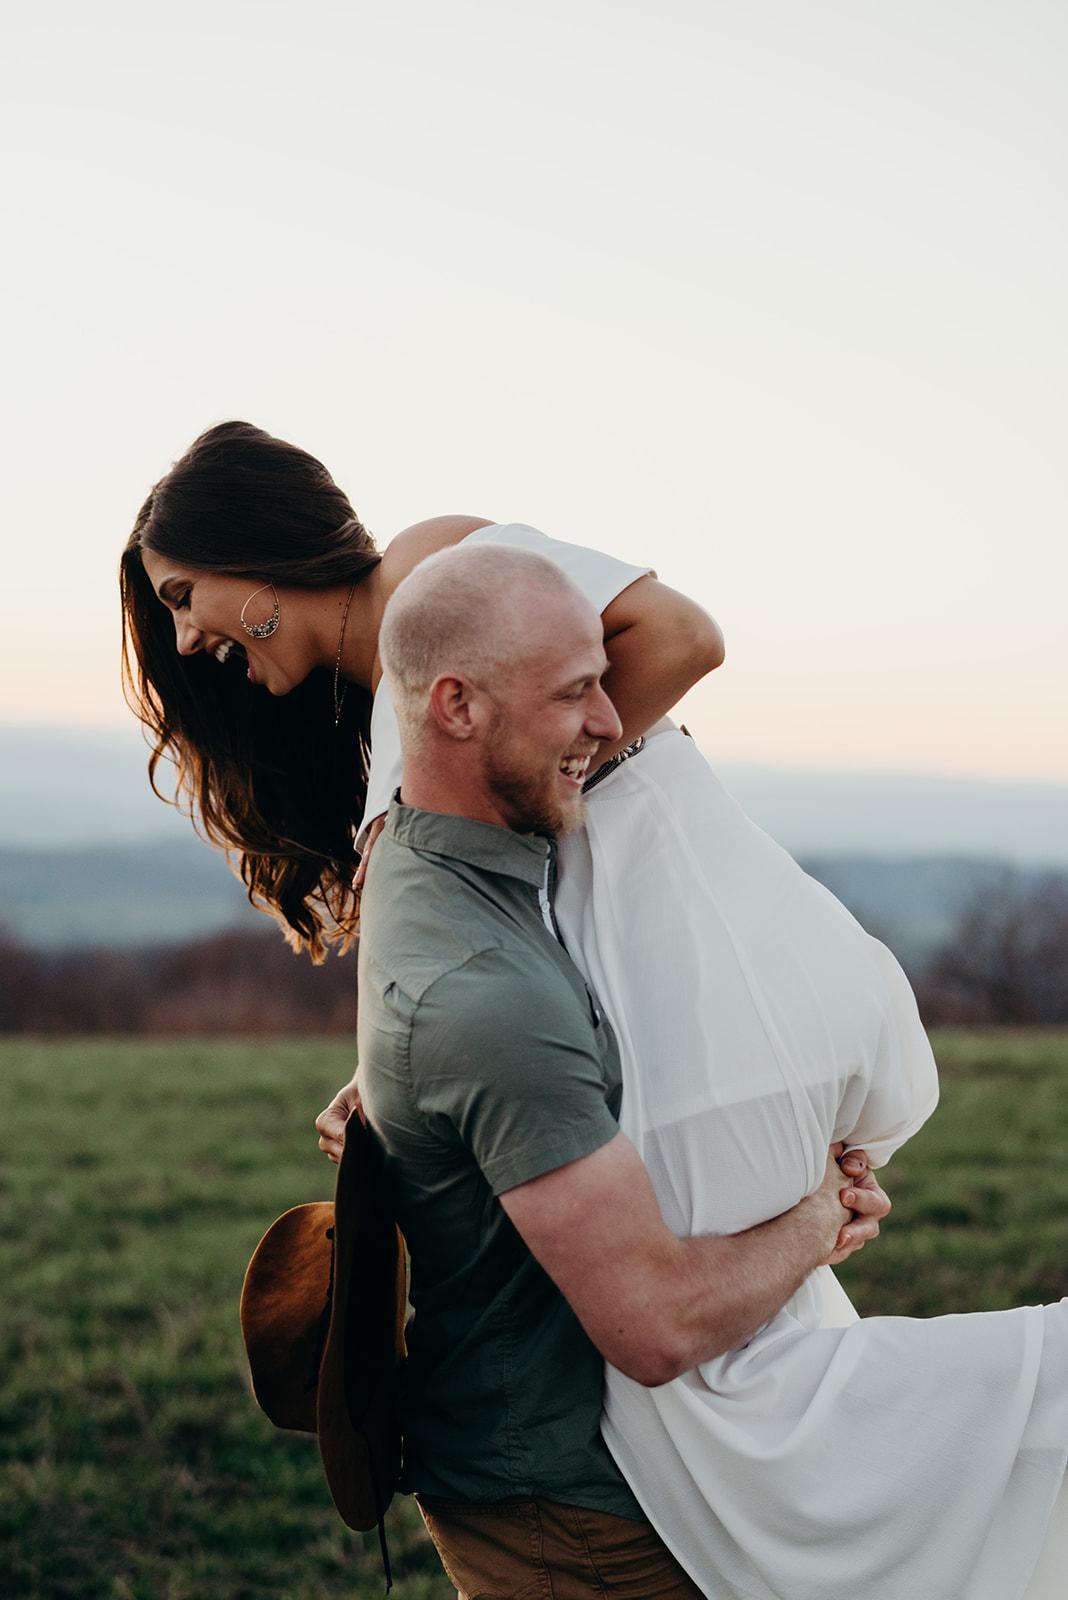 Virginia mountain engagement session Shenandoah valley at sunset fun spinning hug